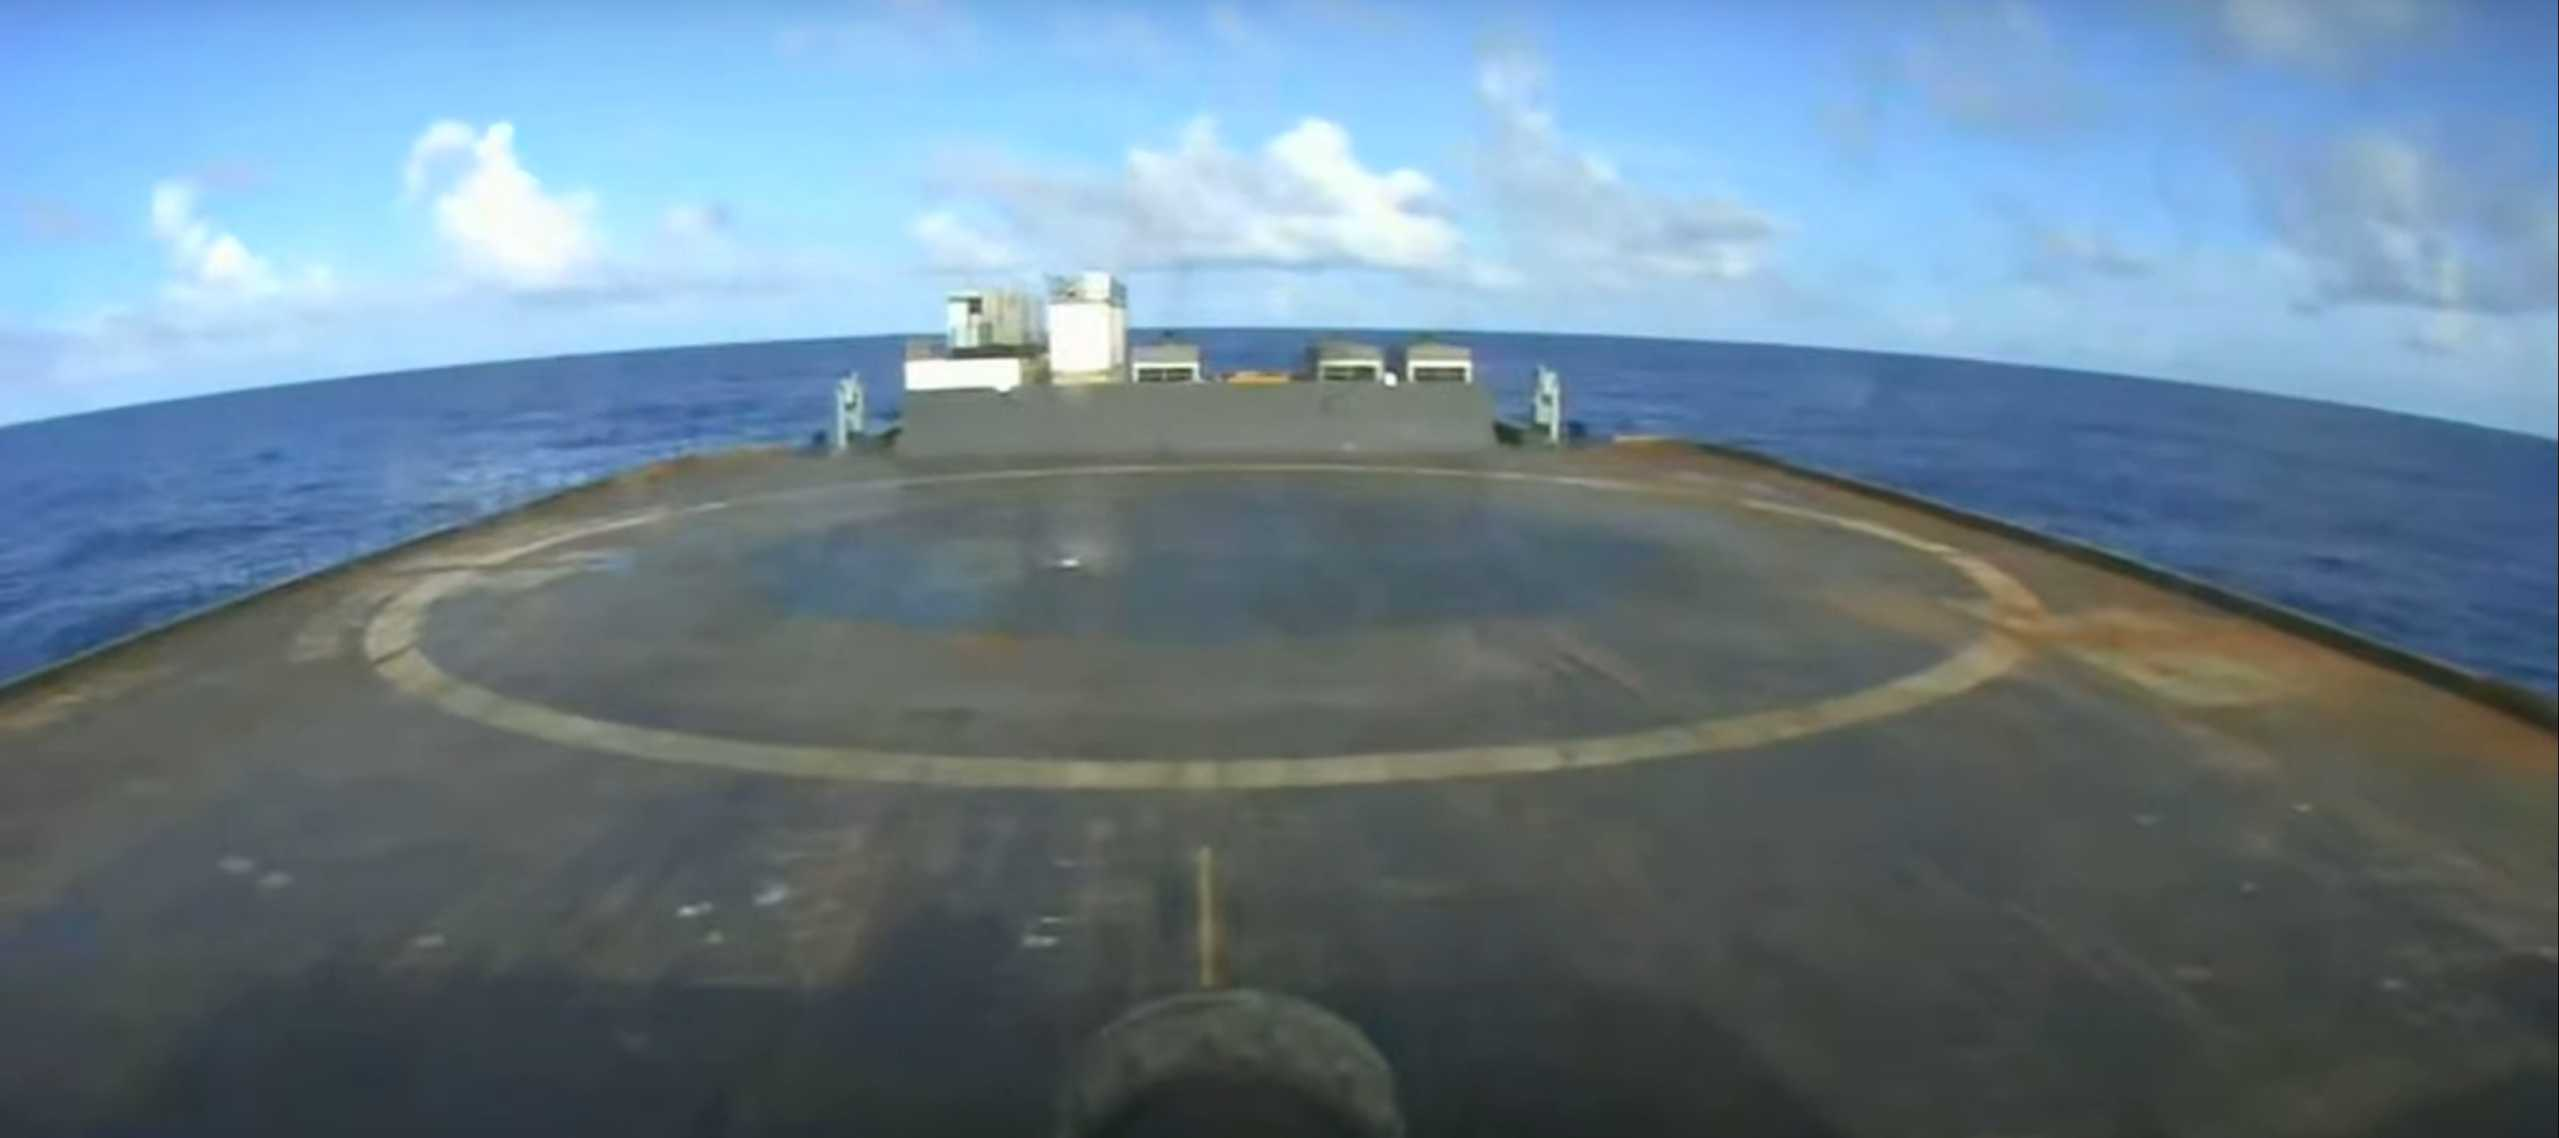 ANASIS II Falcon 9 B1058 LC-40 072020 (SpaceX) JRTI landing 1 (c)